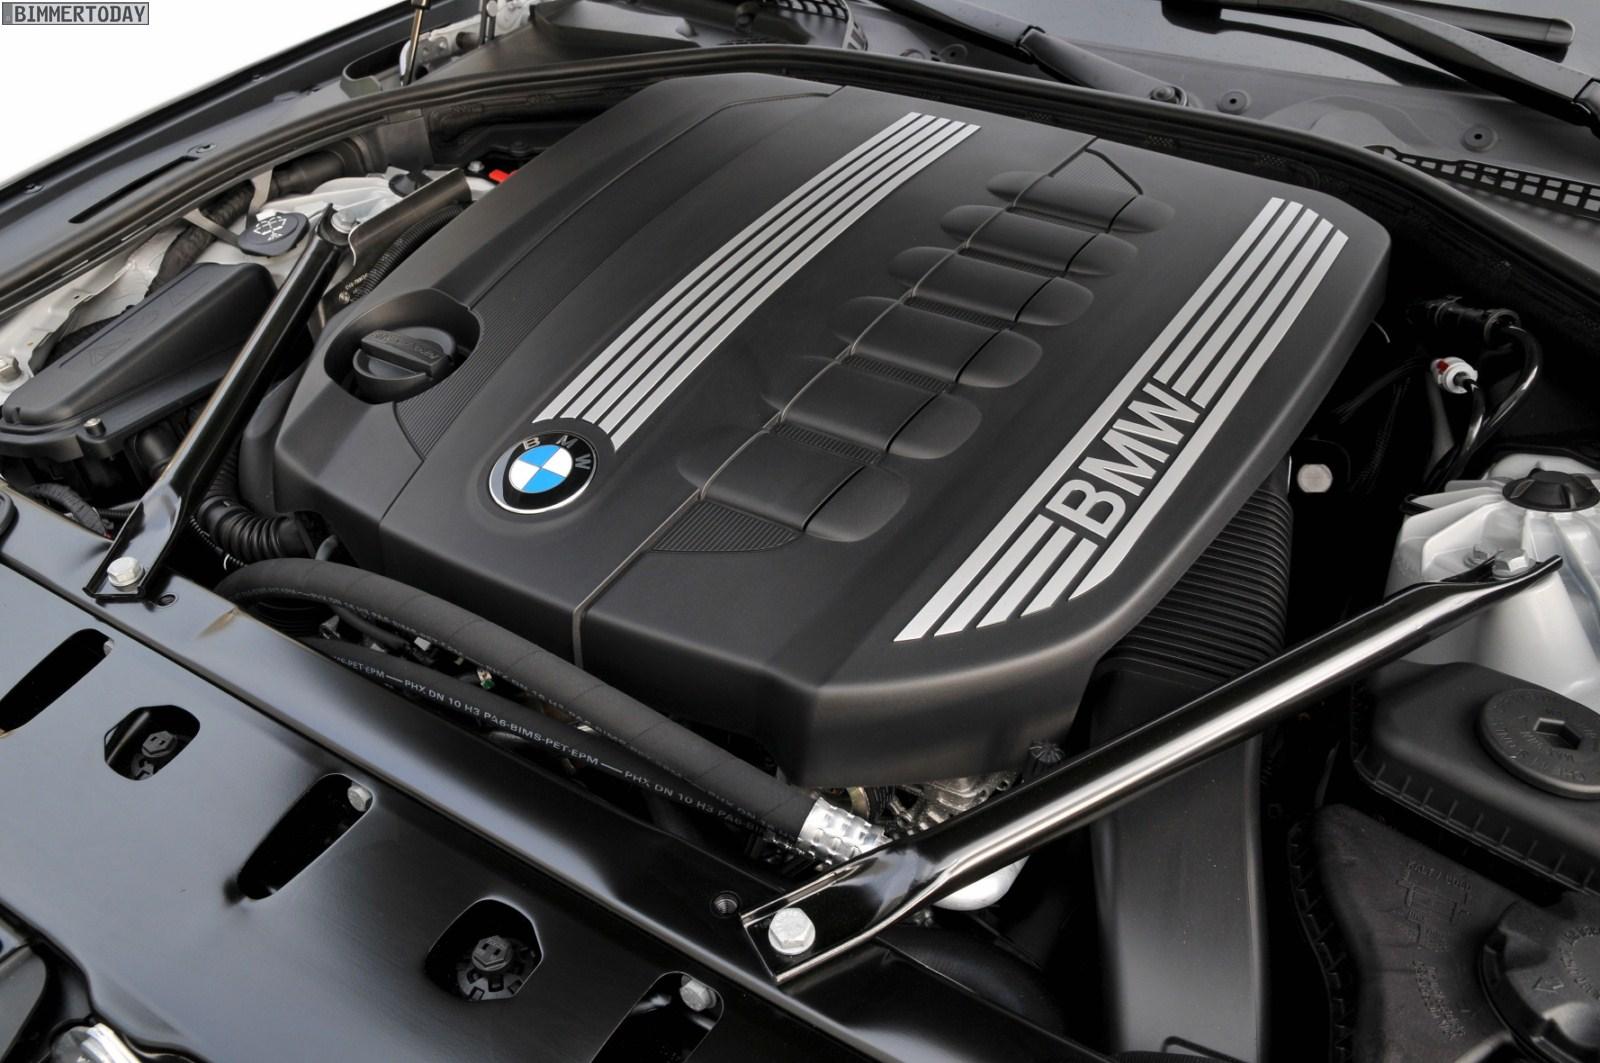 BMW 530d F10 Motorraum